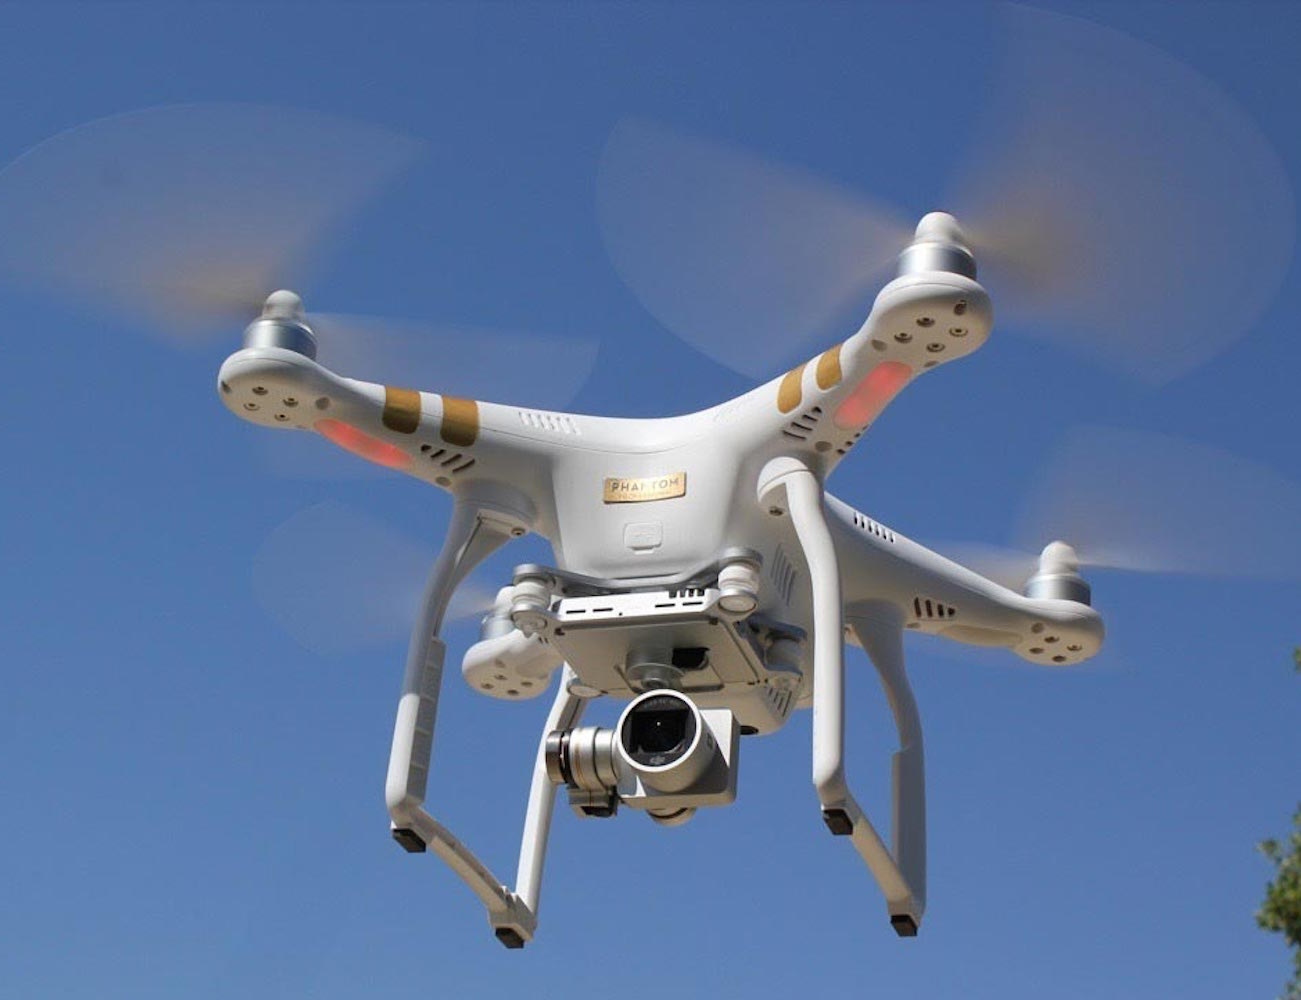 DJI Phantom 3 – Ready To Fly With Built-In Camera